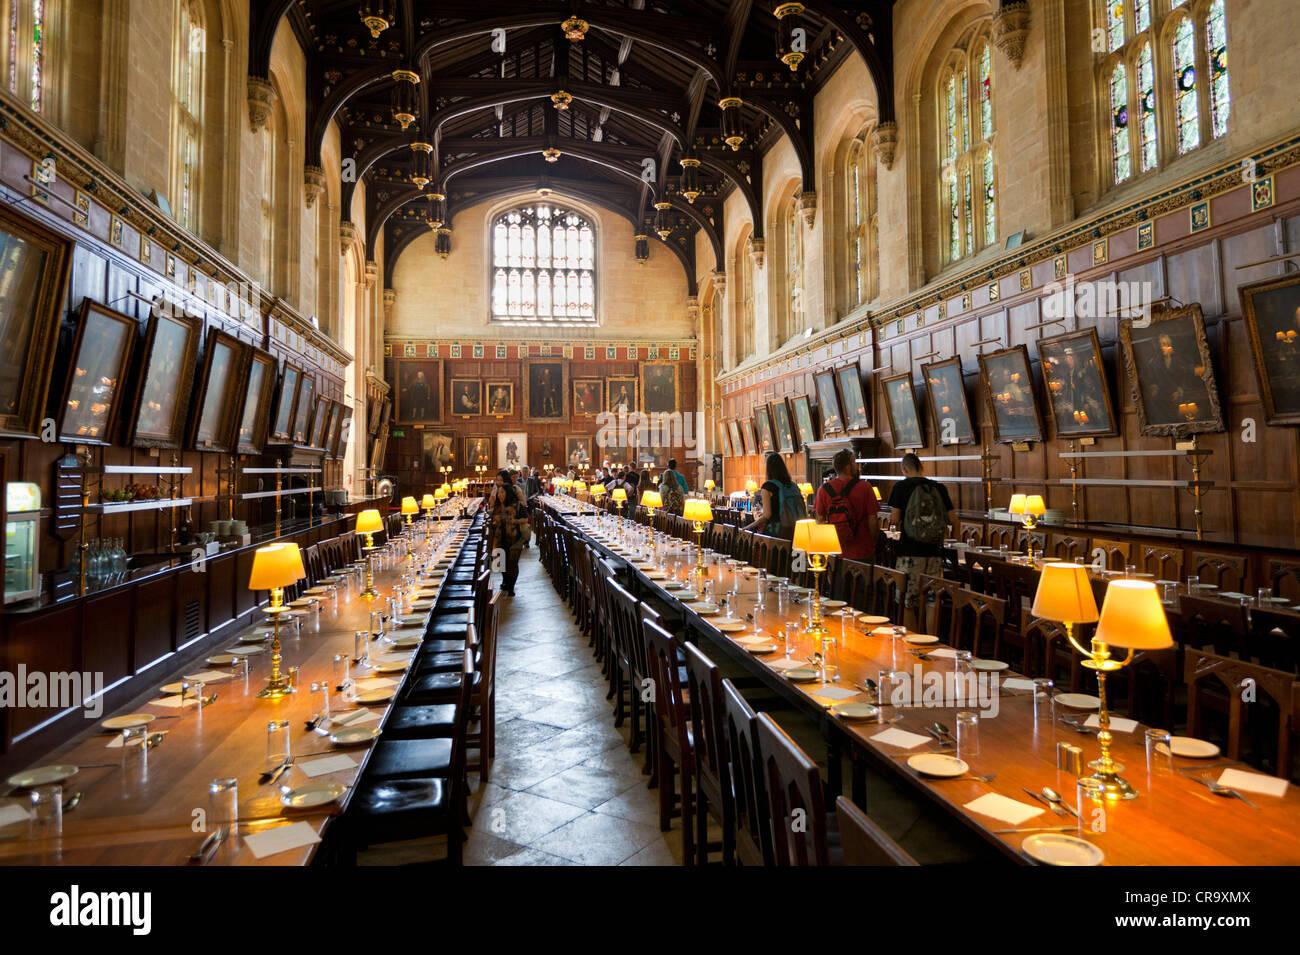 Christ Church College Burgsaal Speisesaal Oxford University Oxfordshire England UK GB EU Europa Stockbild